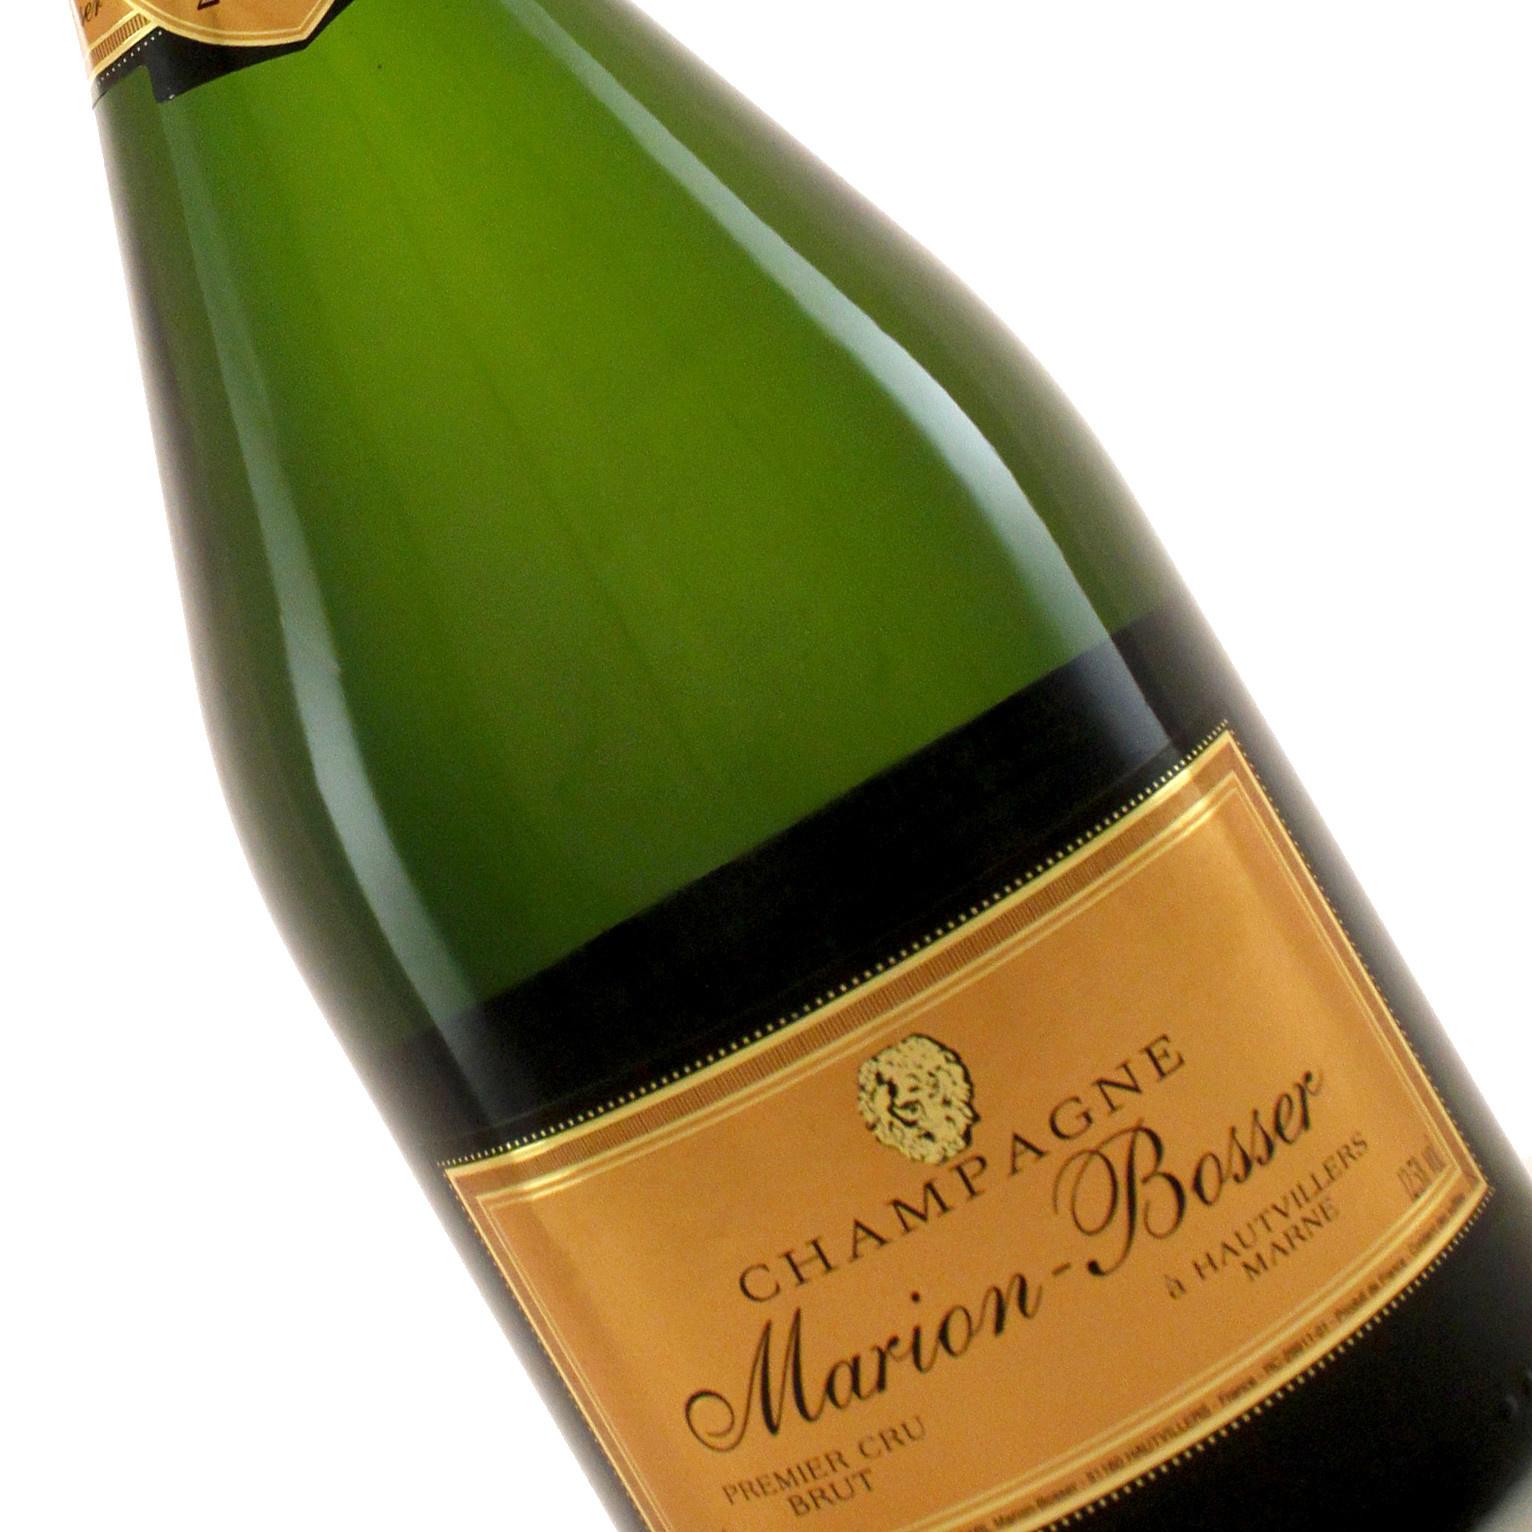 Marion-Bosser 2012 Premier Cru Brut, Champagne